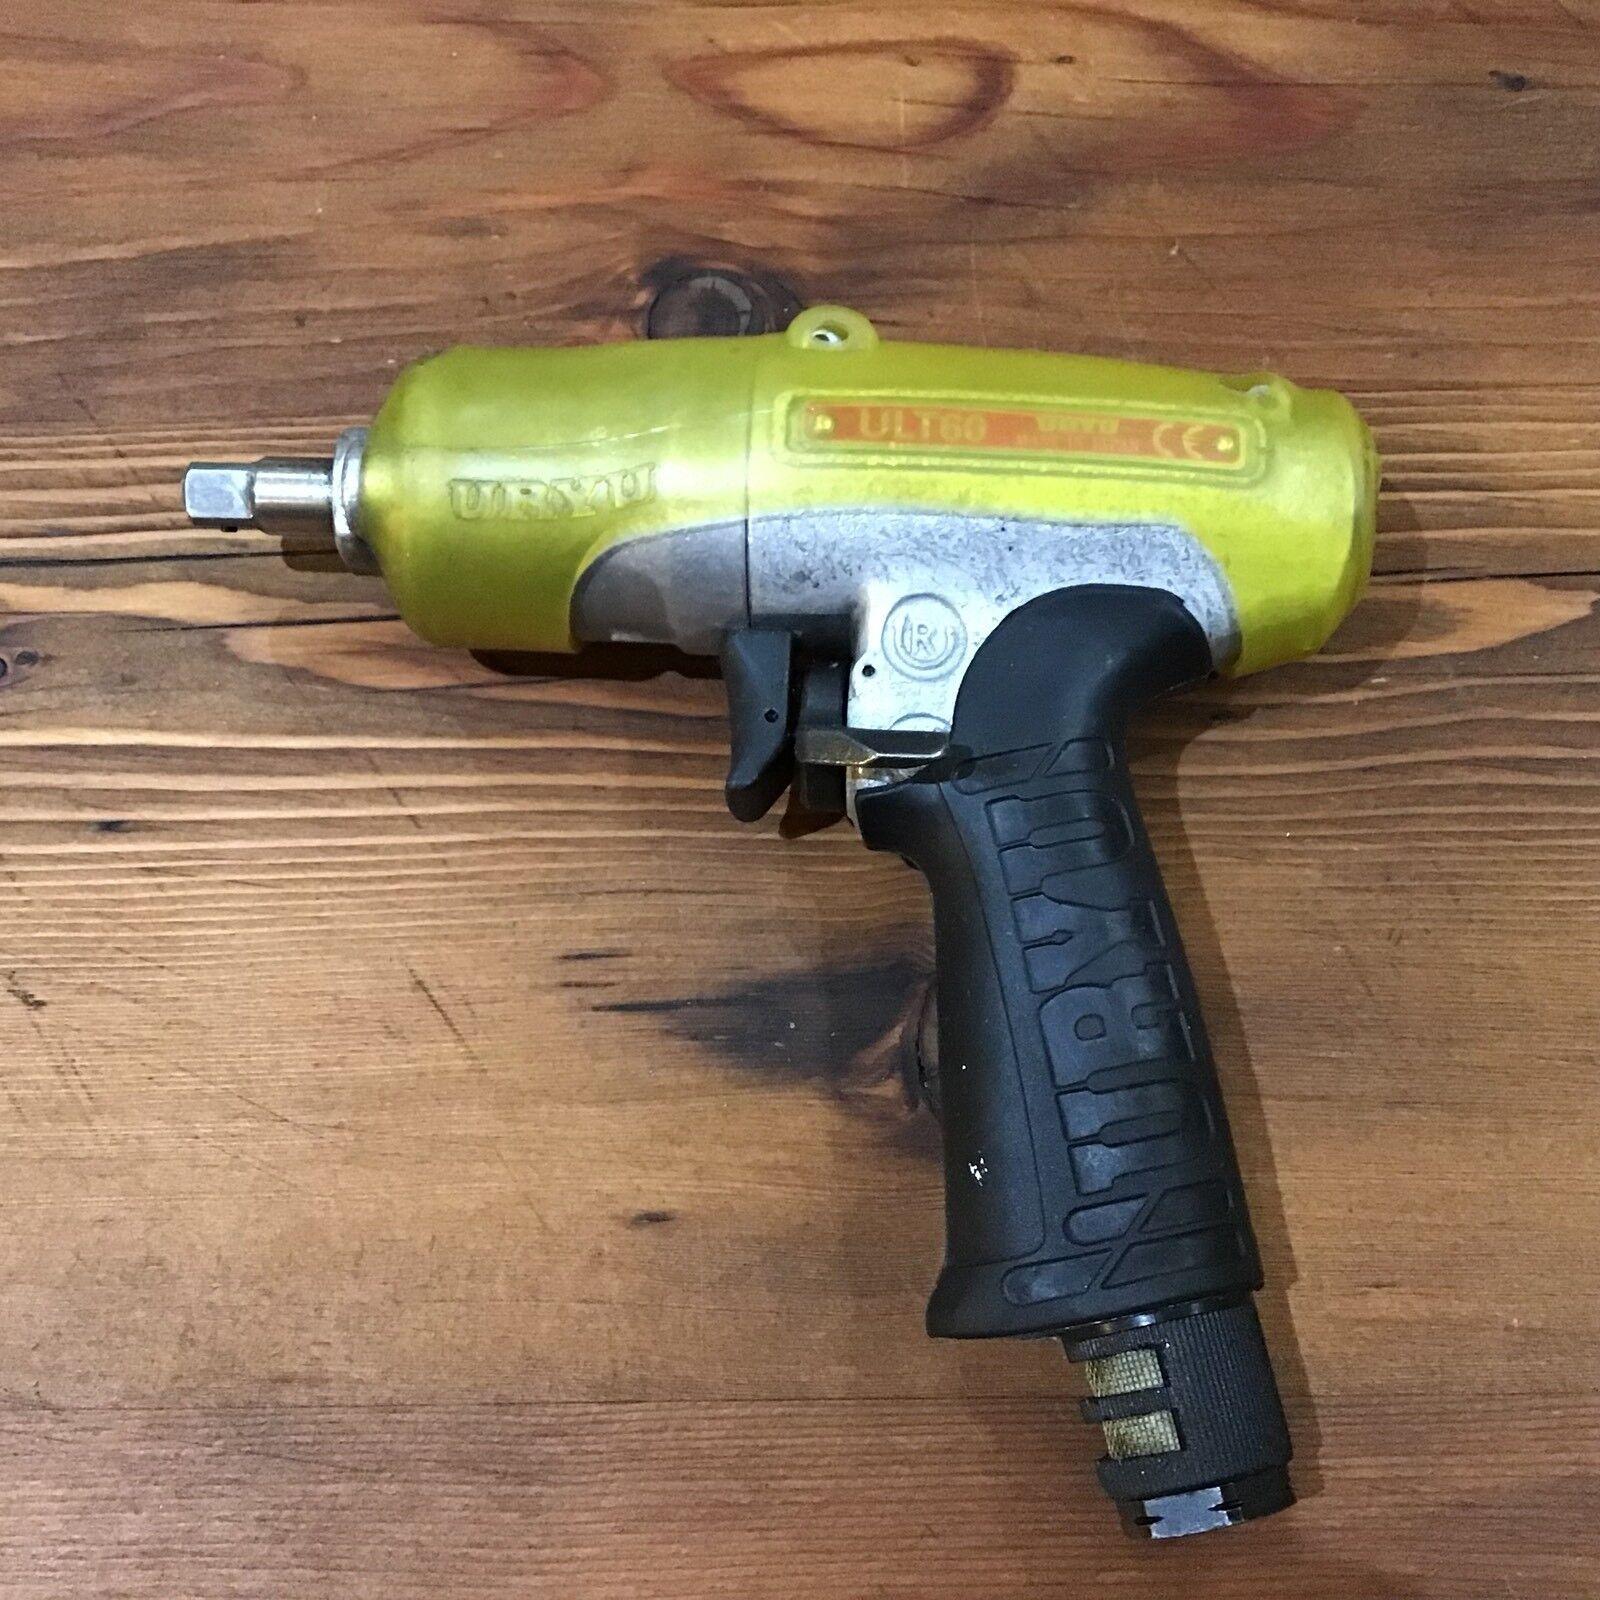 "URYU, ULT 60, 3 8""Drive Pulse Tool, Pneumatic   Air Tool, Nutrunner , Japan"